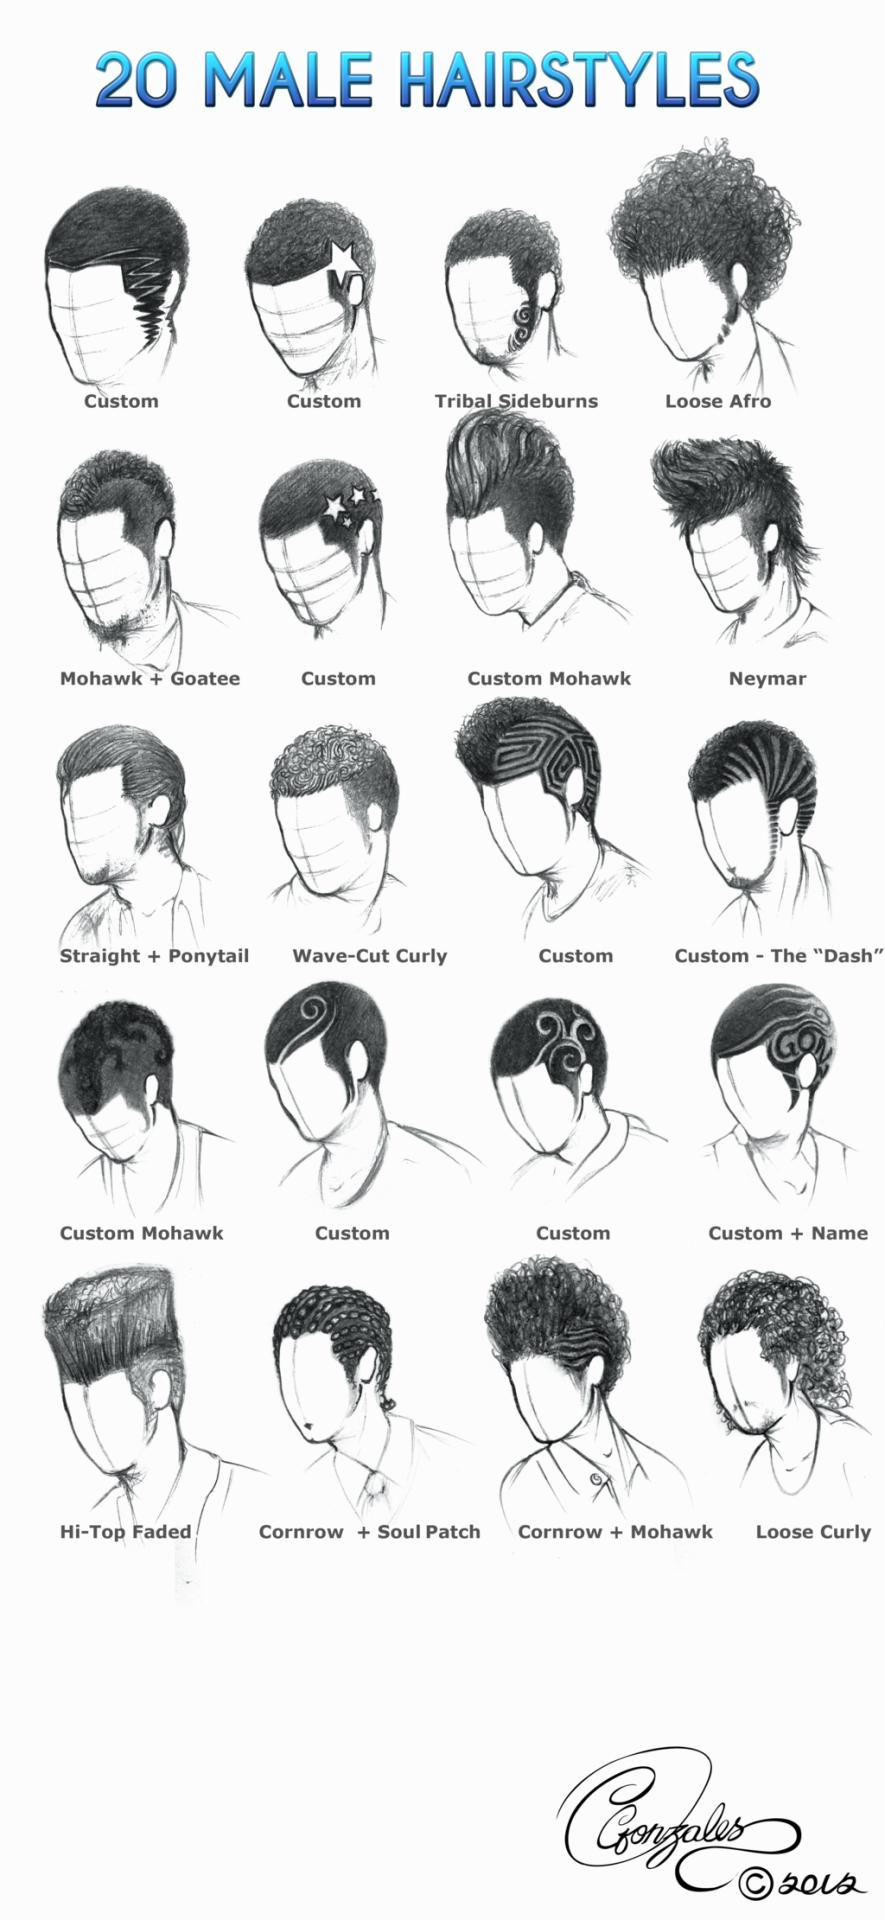 helpyoudraw: 50 male hairstyles - revamped by orangenuke 20 male